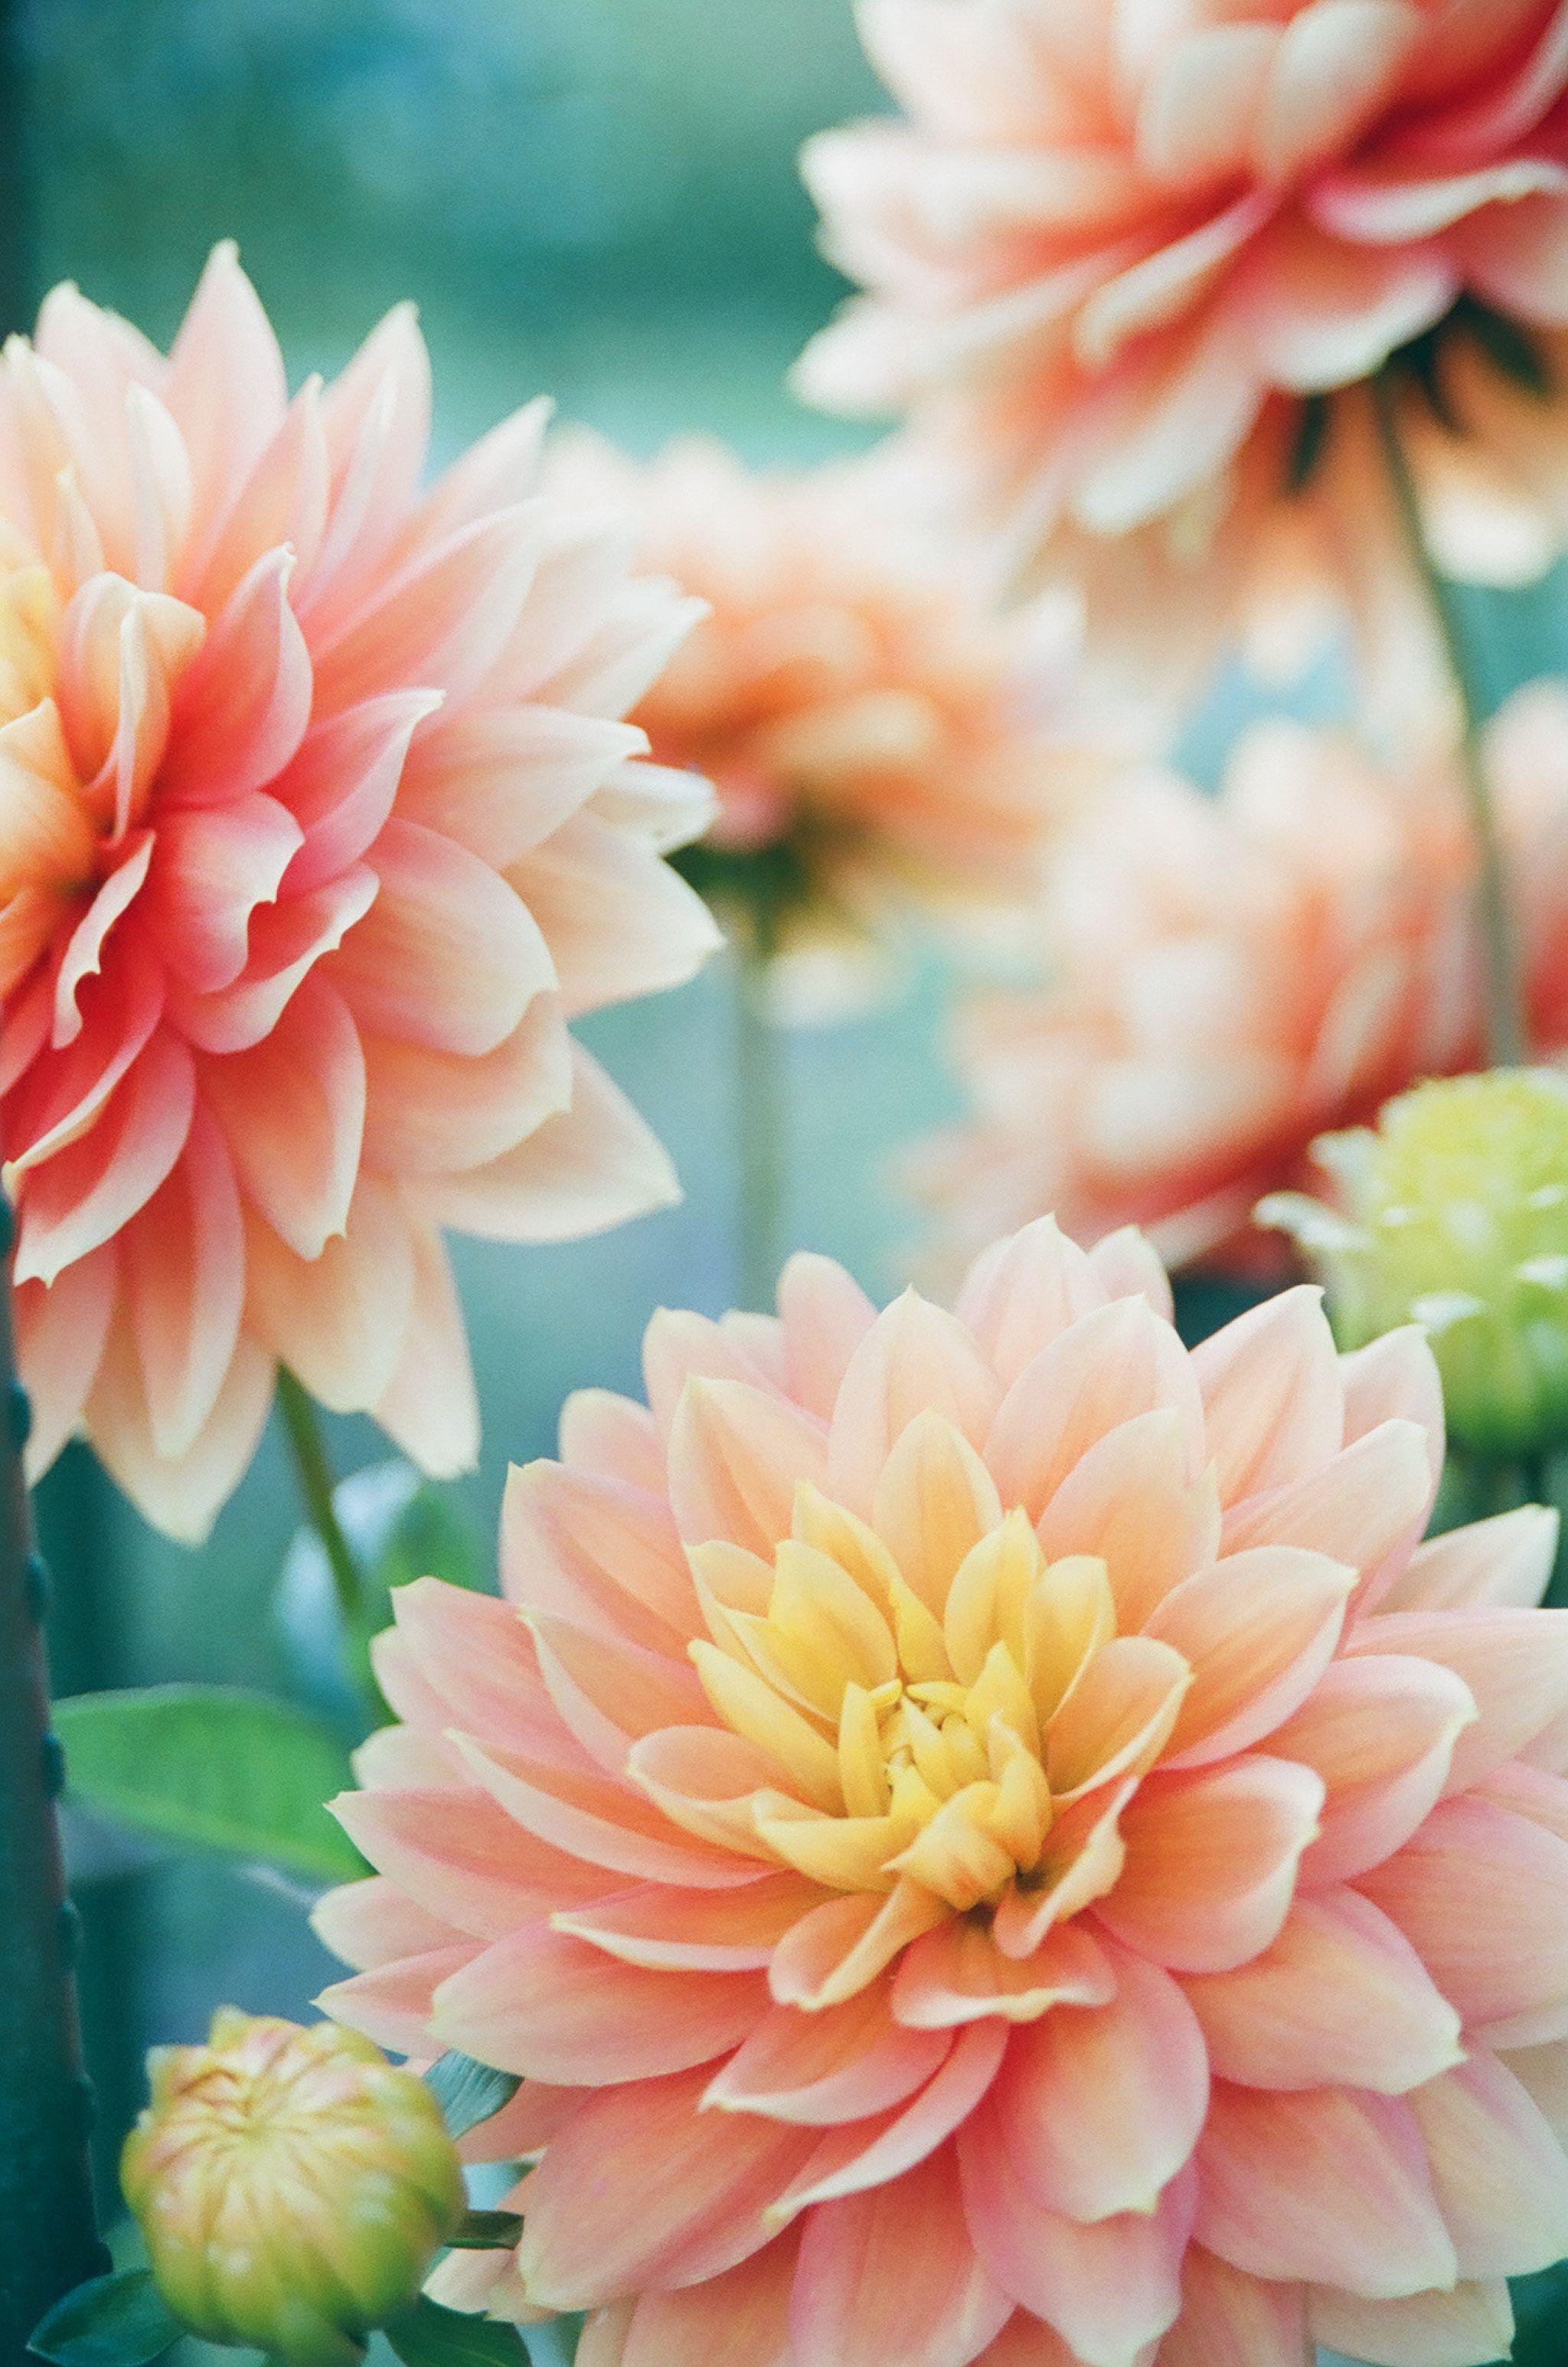 Vines Kanken Dahlia Kanken Dahlia Dahlia Flower Arrangements Dahlia Meaning Dahlia Flower Tattoo Dahlia In 2020 Flower Pictures Flower Wallpaper Dahlia Flower